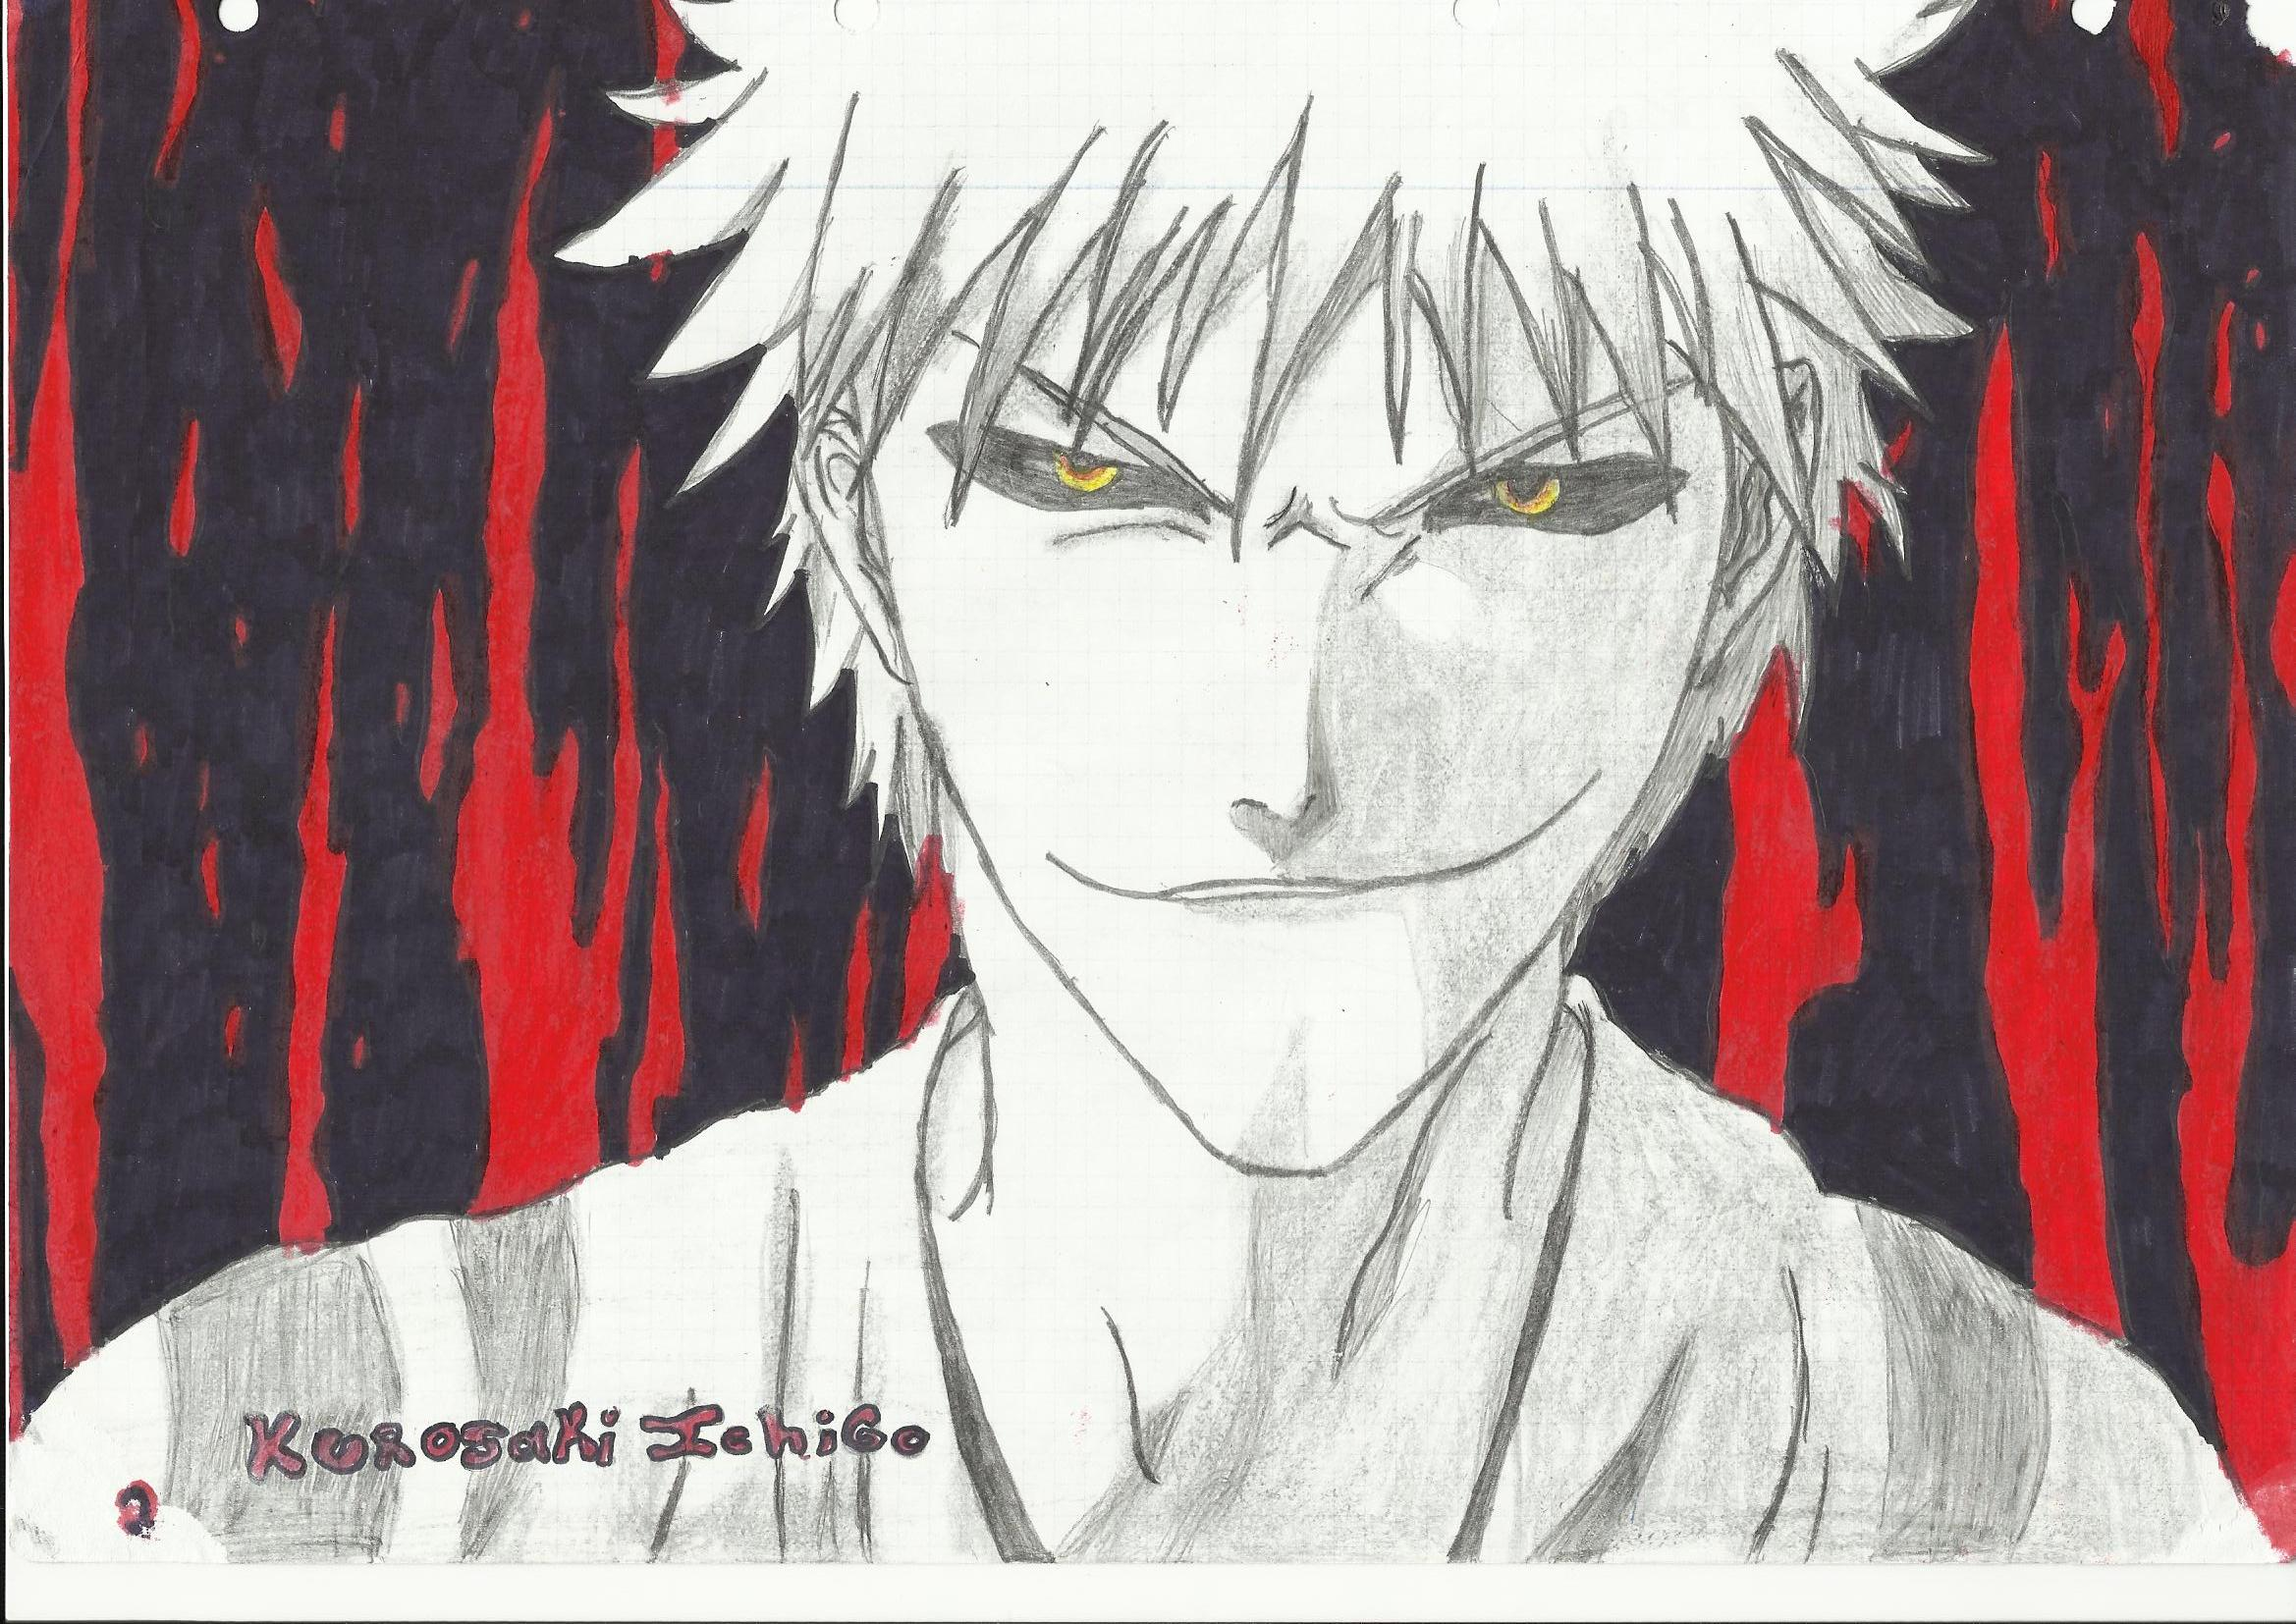 dibujos anime 14 | Alhadra Digital